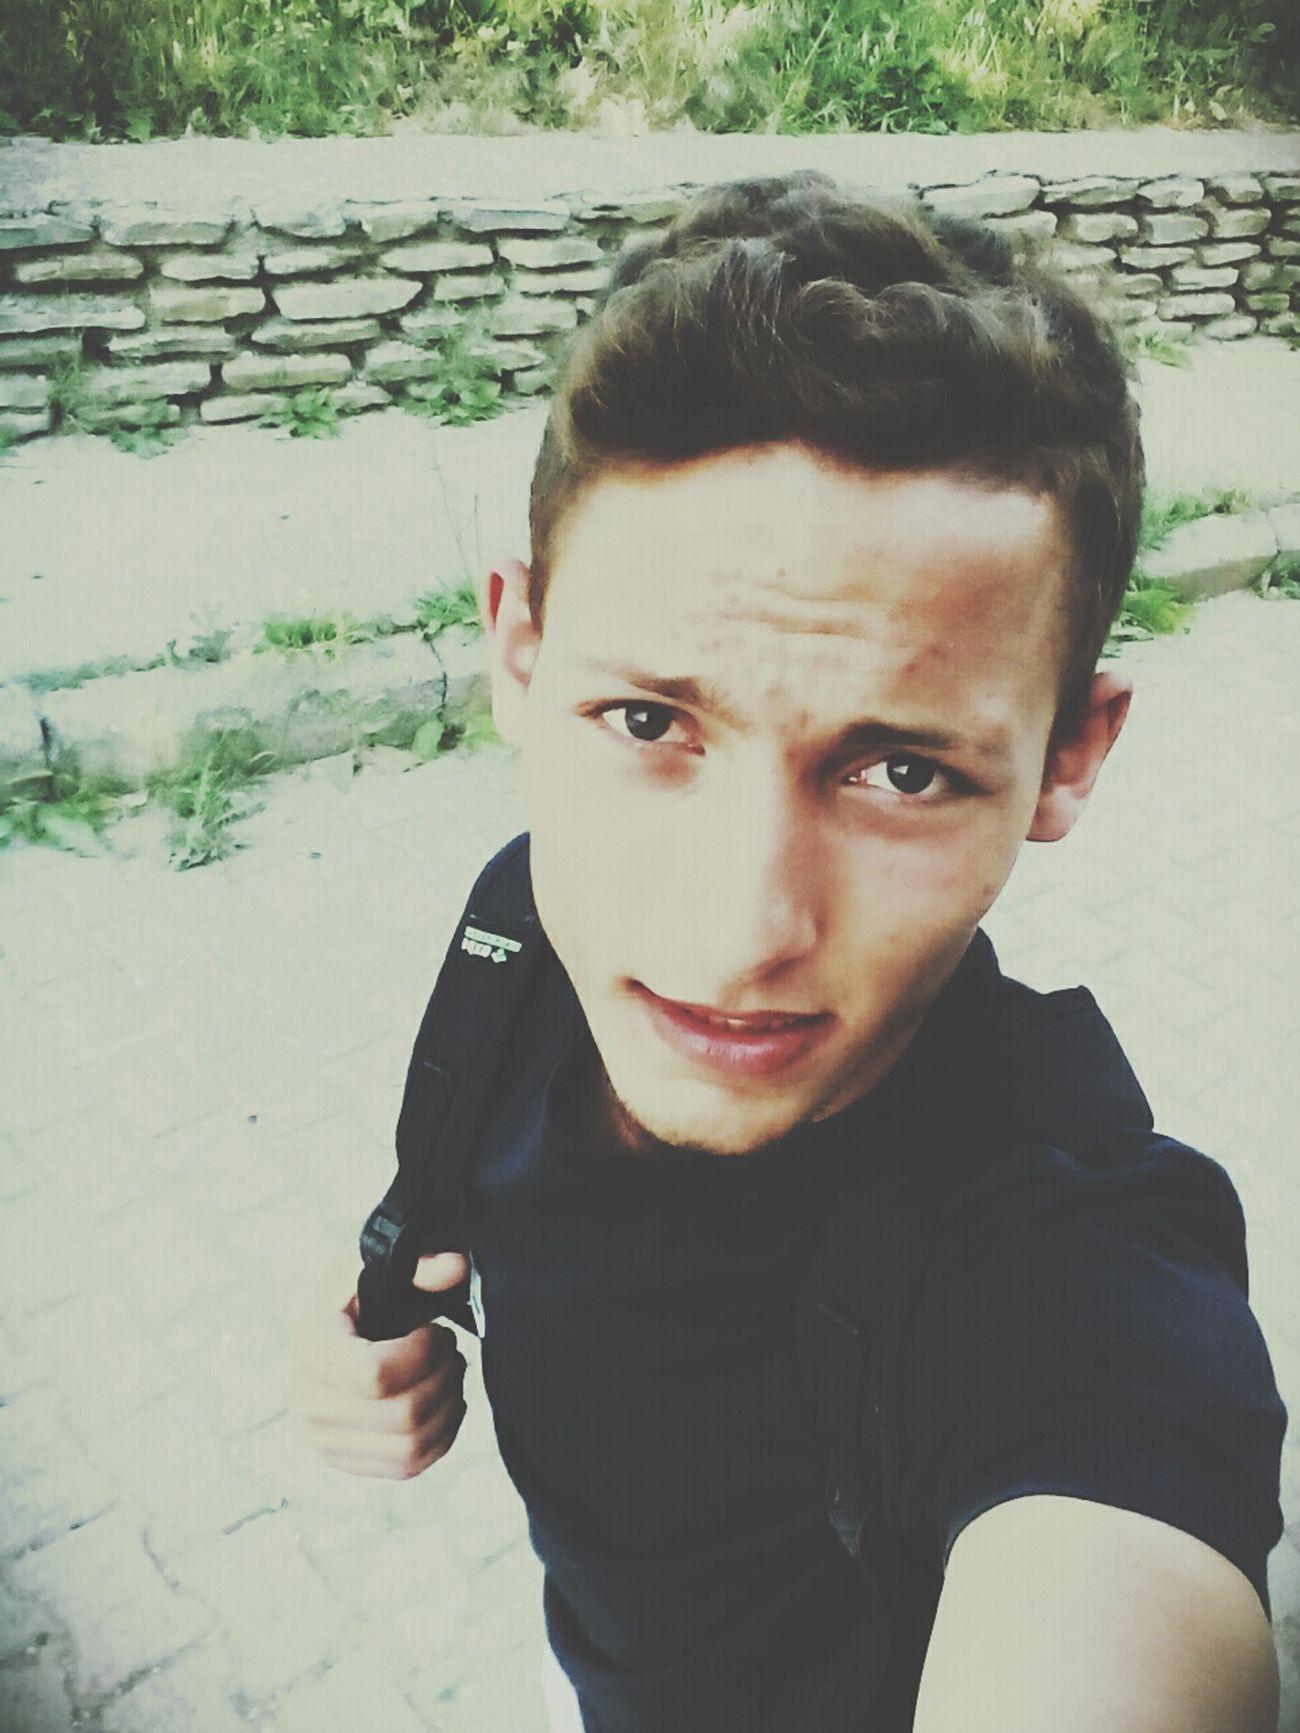 Summertime ☀ Summerdays  🌊🏄